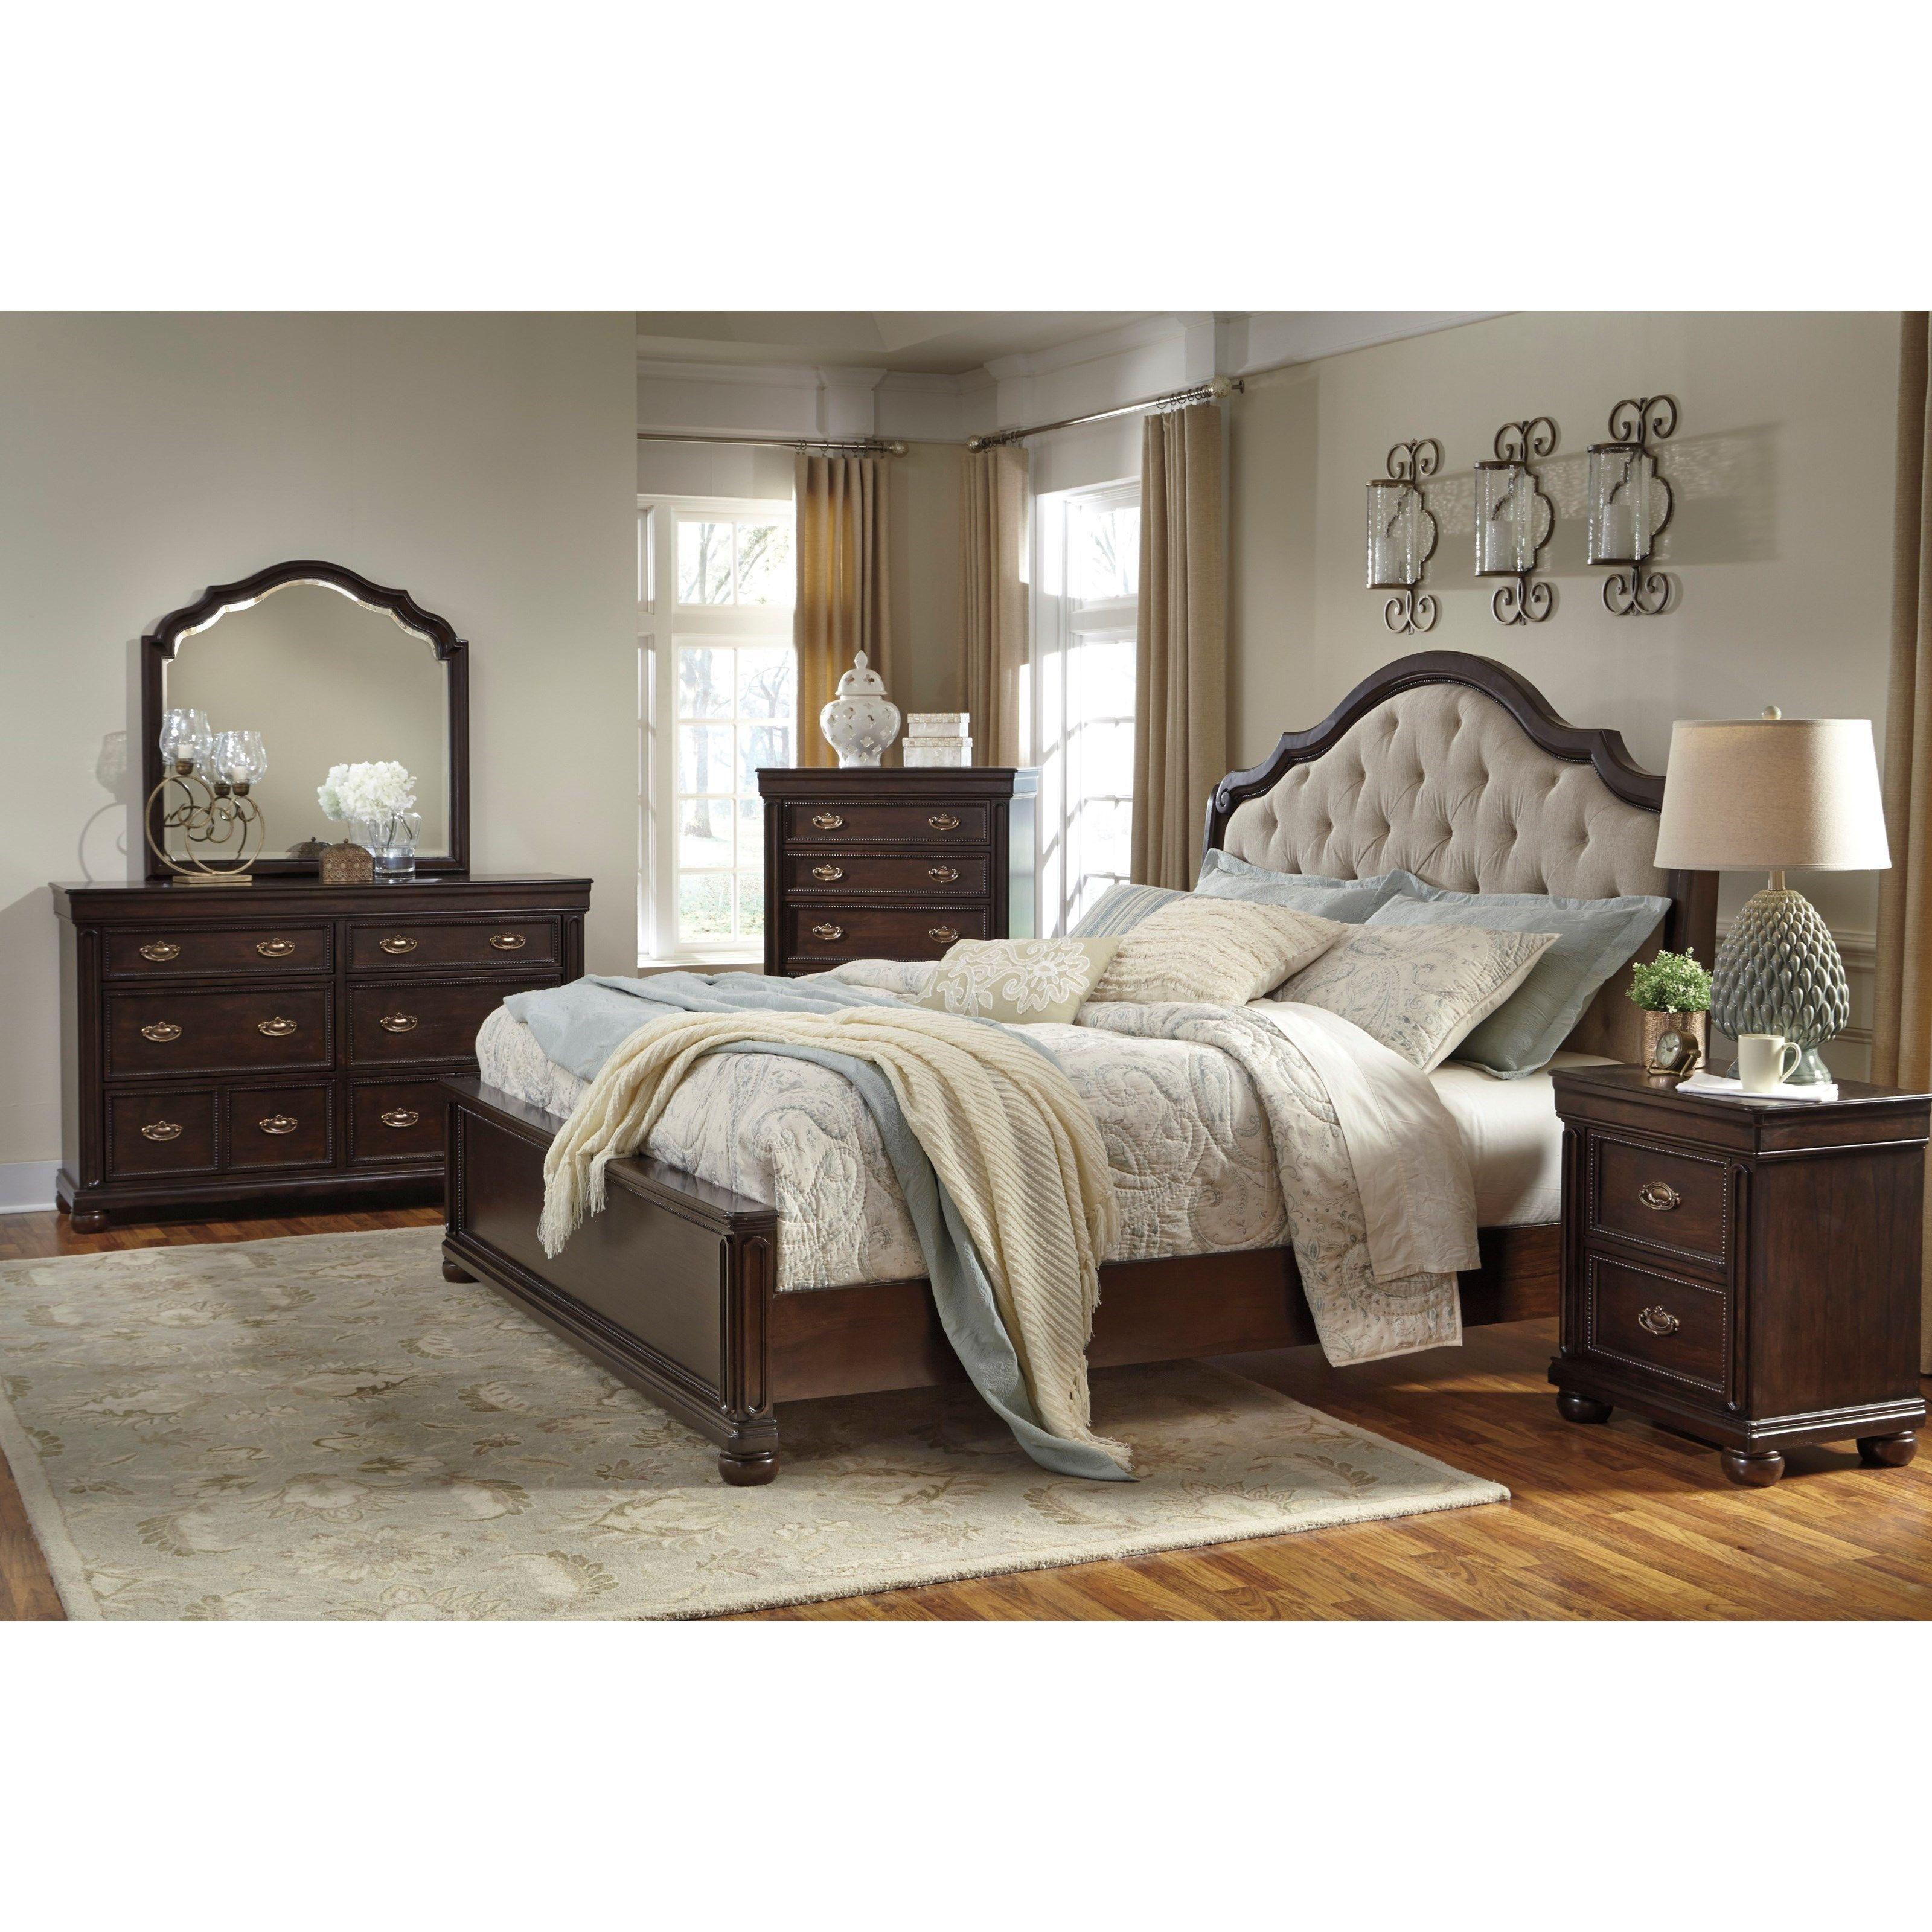 Moluxy California King Bedroom Groupsignature Designashley Awesome Signature Design Bedroom Furniture Decorating Design